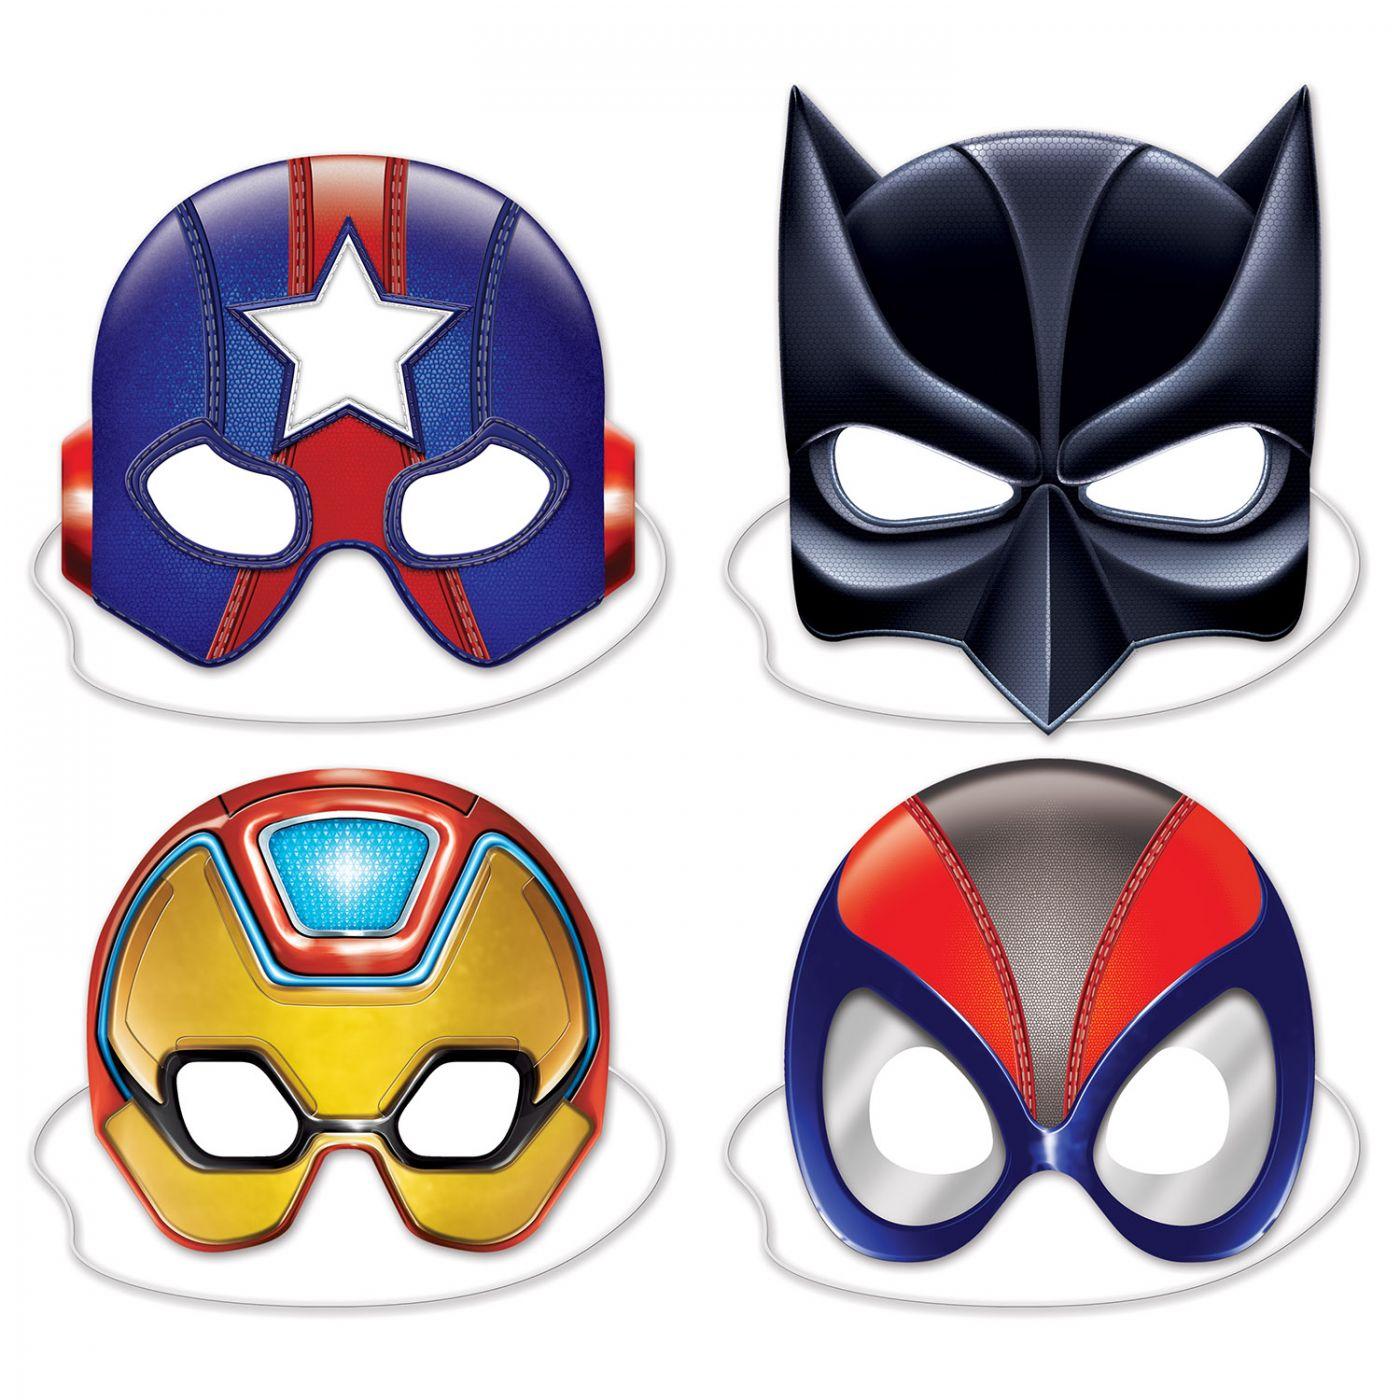 Image of Deluxe Hero Masks